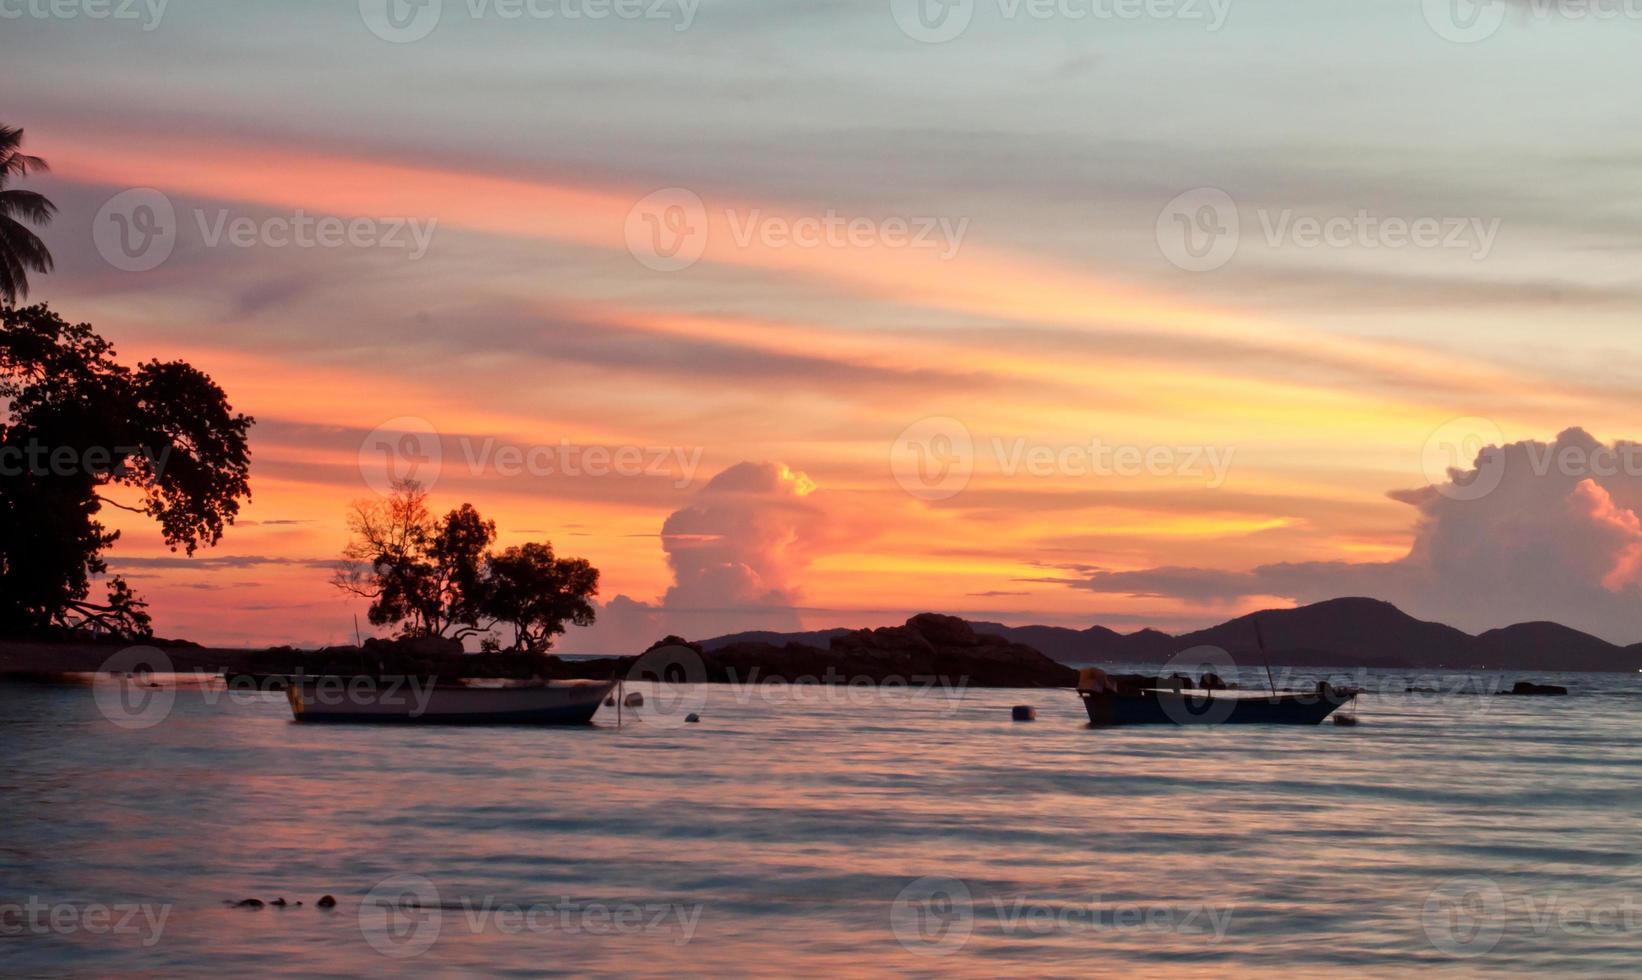 Pattaya, Thaïlande, Wongamat Beach au coucher du soleil (Koh Larn View) photo